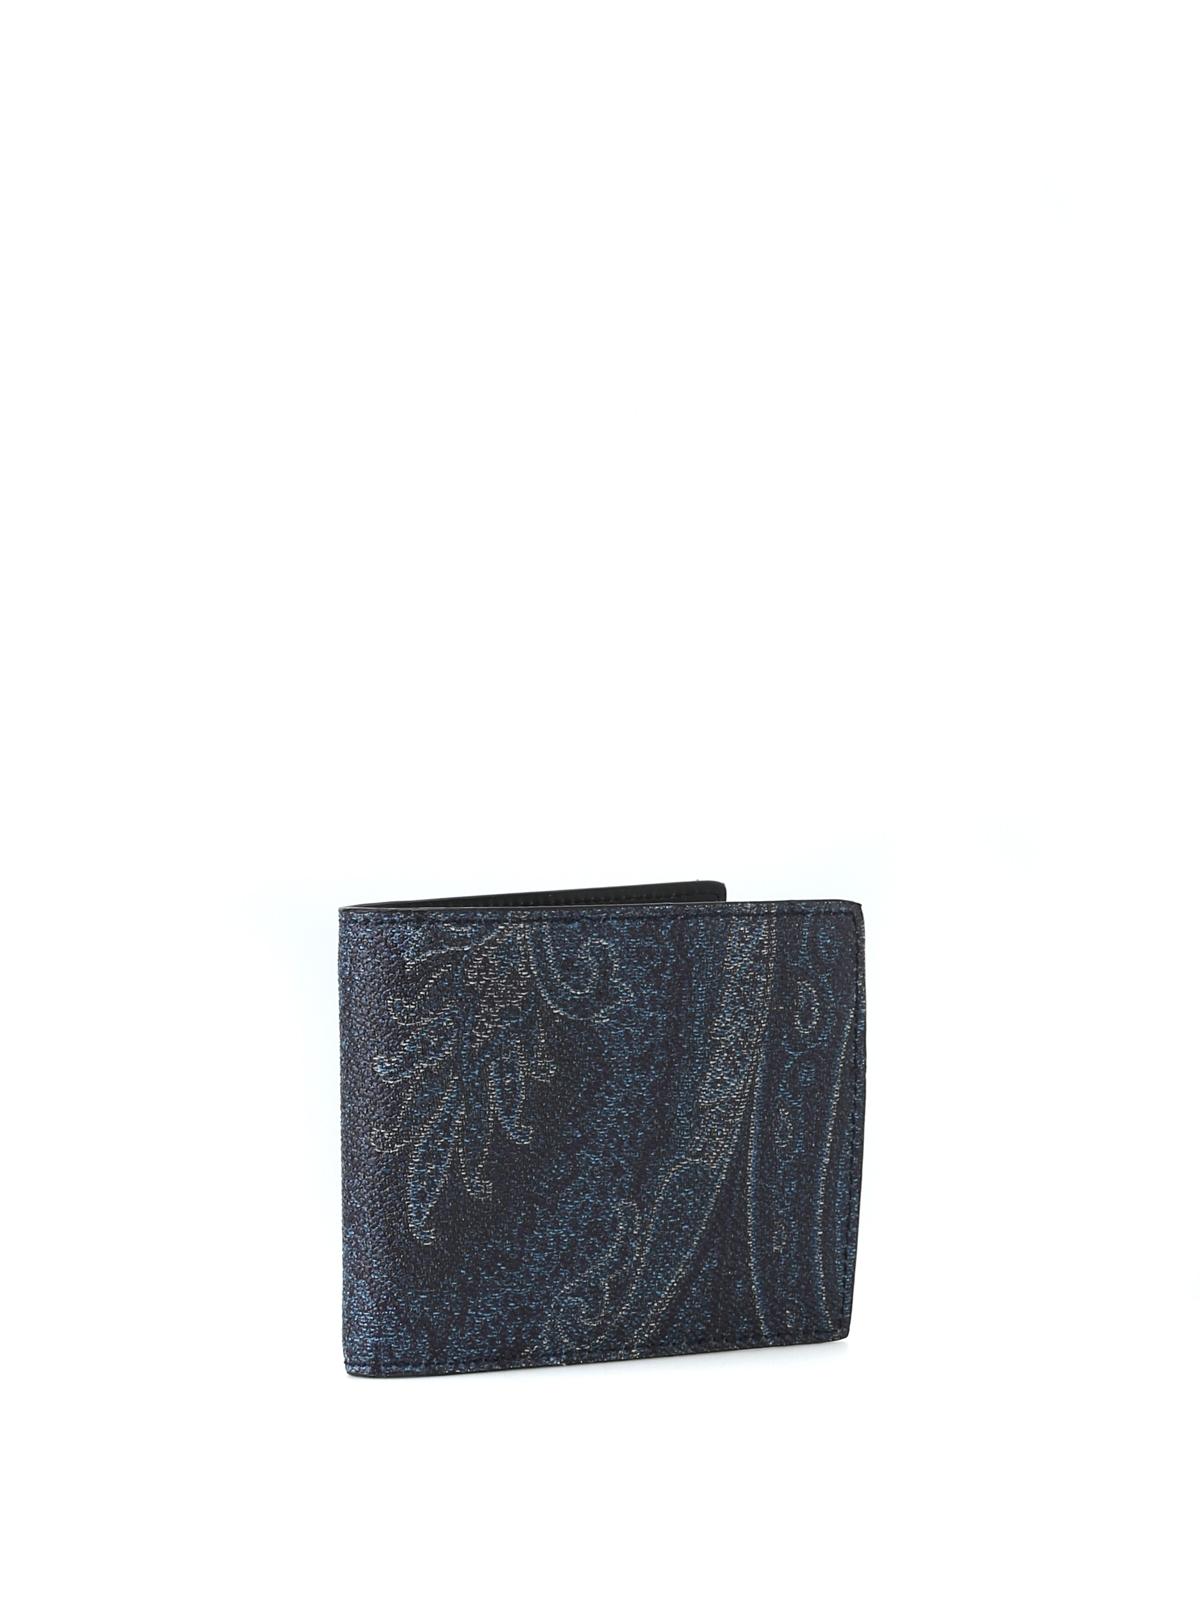 917c230aae ETRO: portafogli online - Portafoglio blu scuro in tessuto paisley